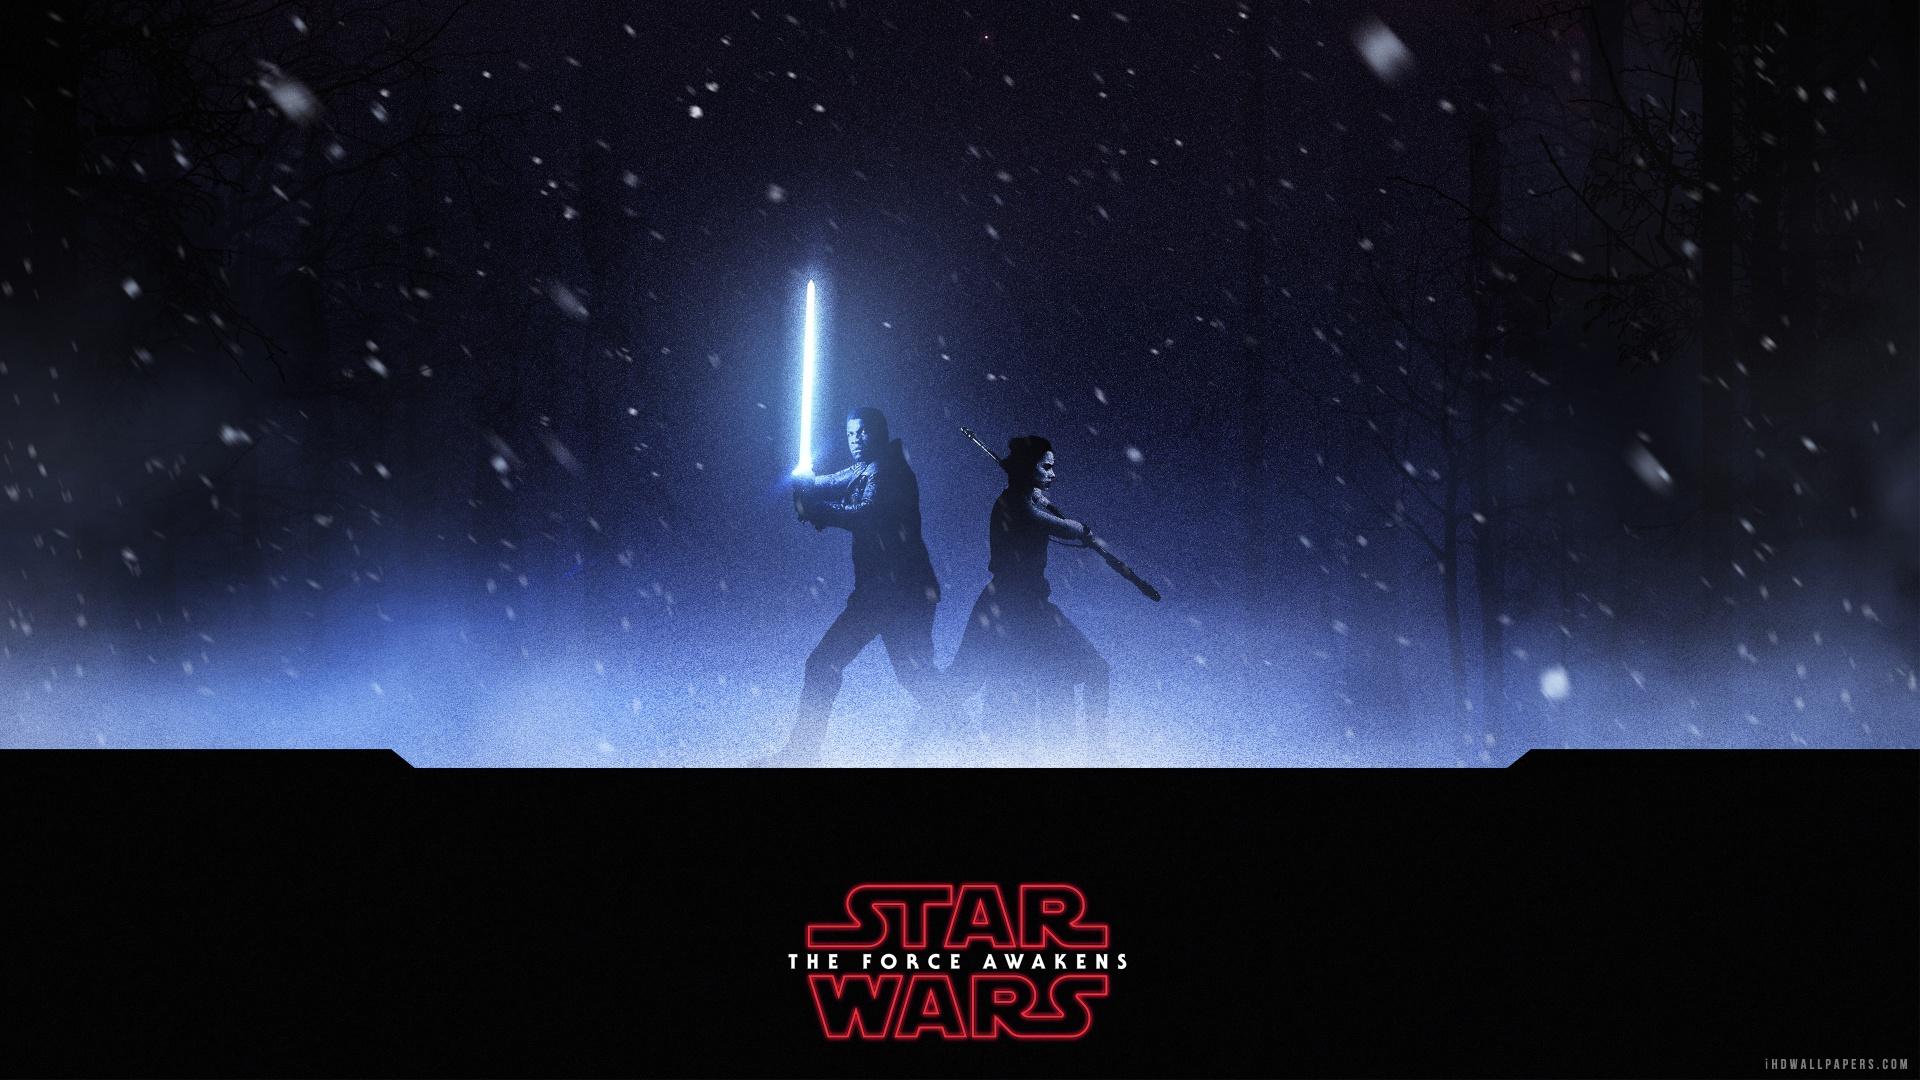 Finn Rey Star Wars The Force Awakens HD Wallpaper   iHD Wallpapers 1920x1080